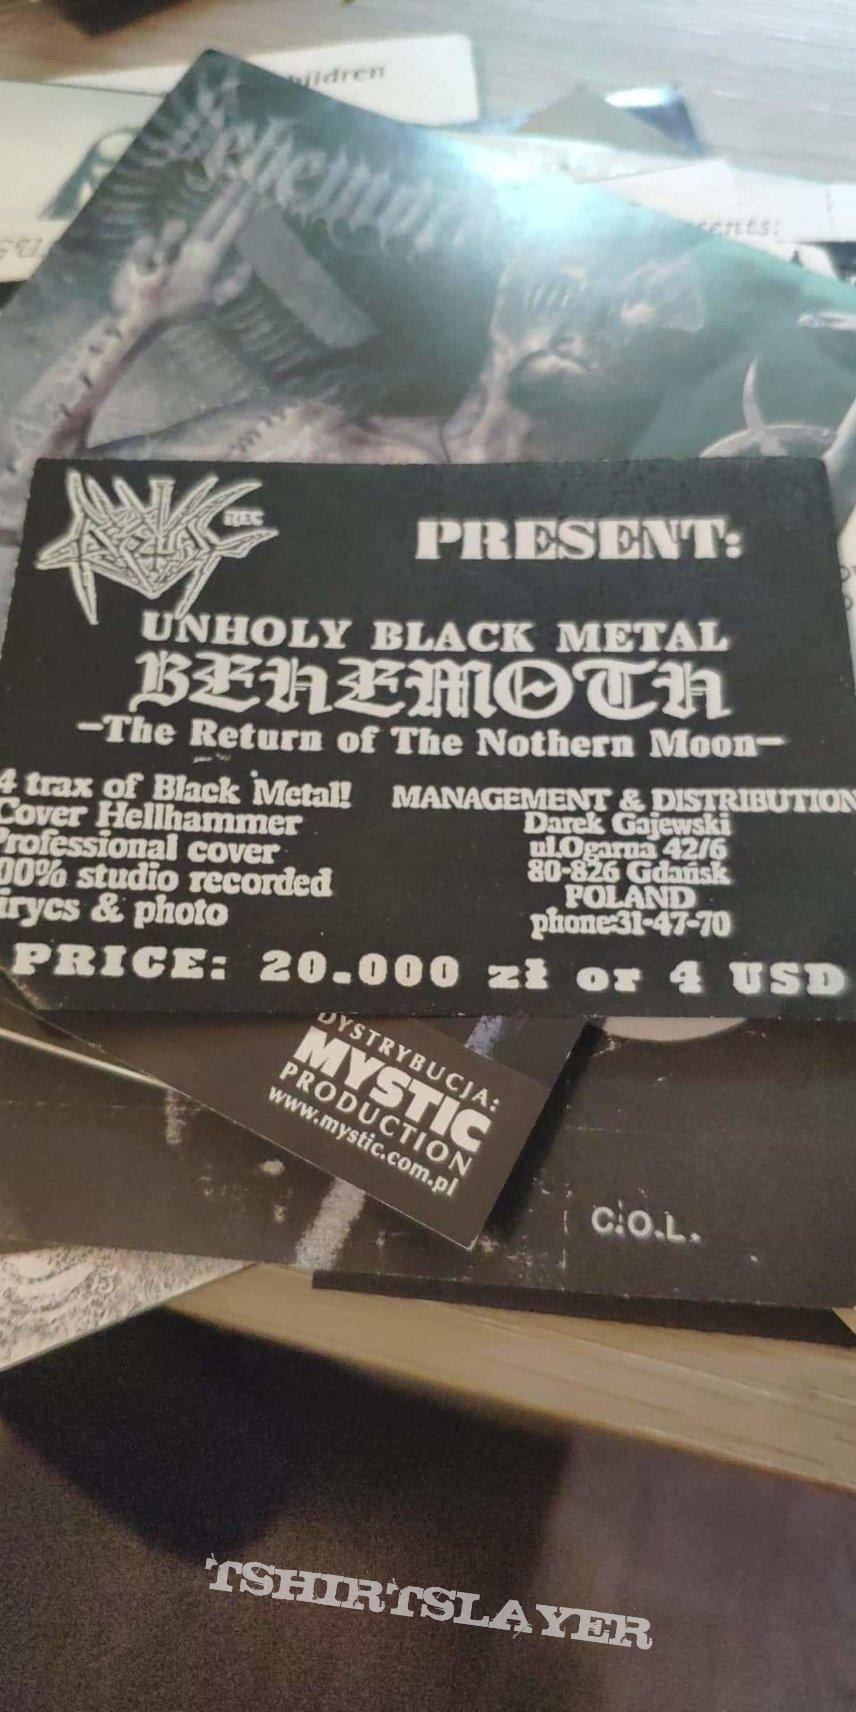 Behemoth - The Return of the Northern Moim flyer Bestial Rec